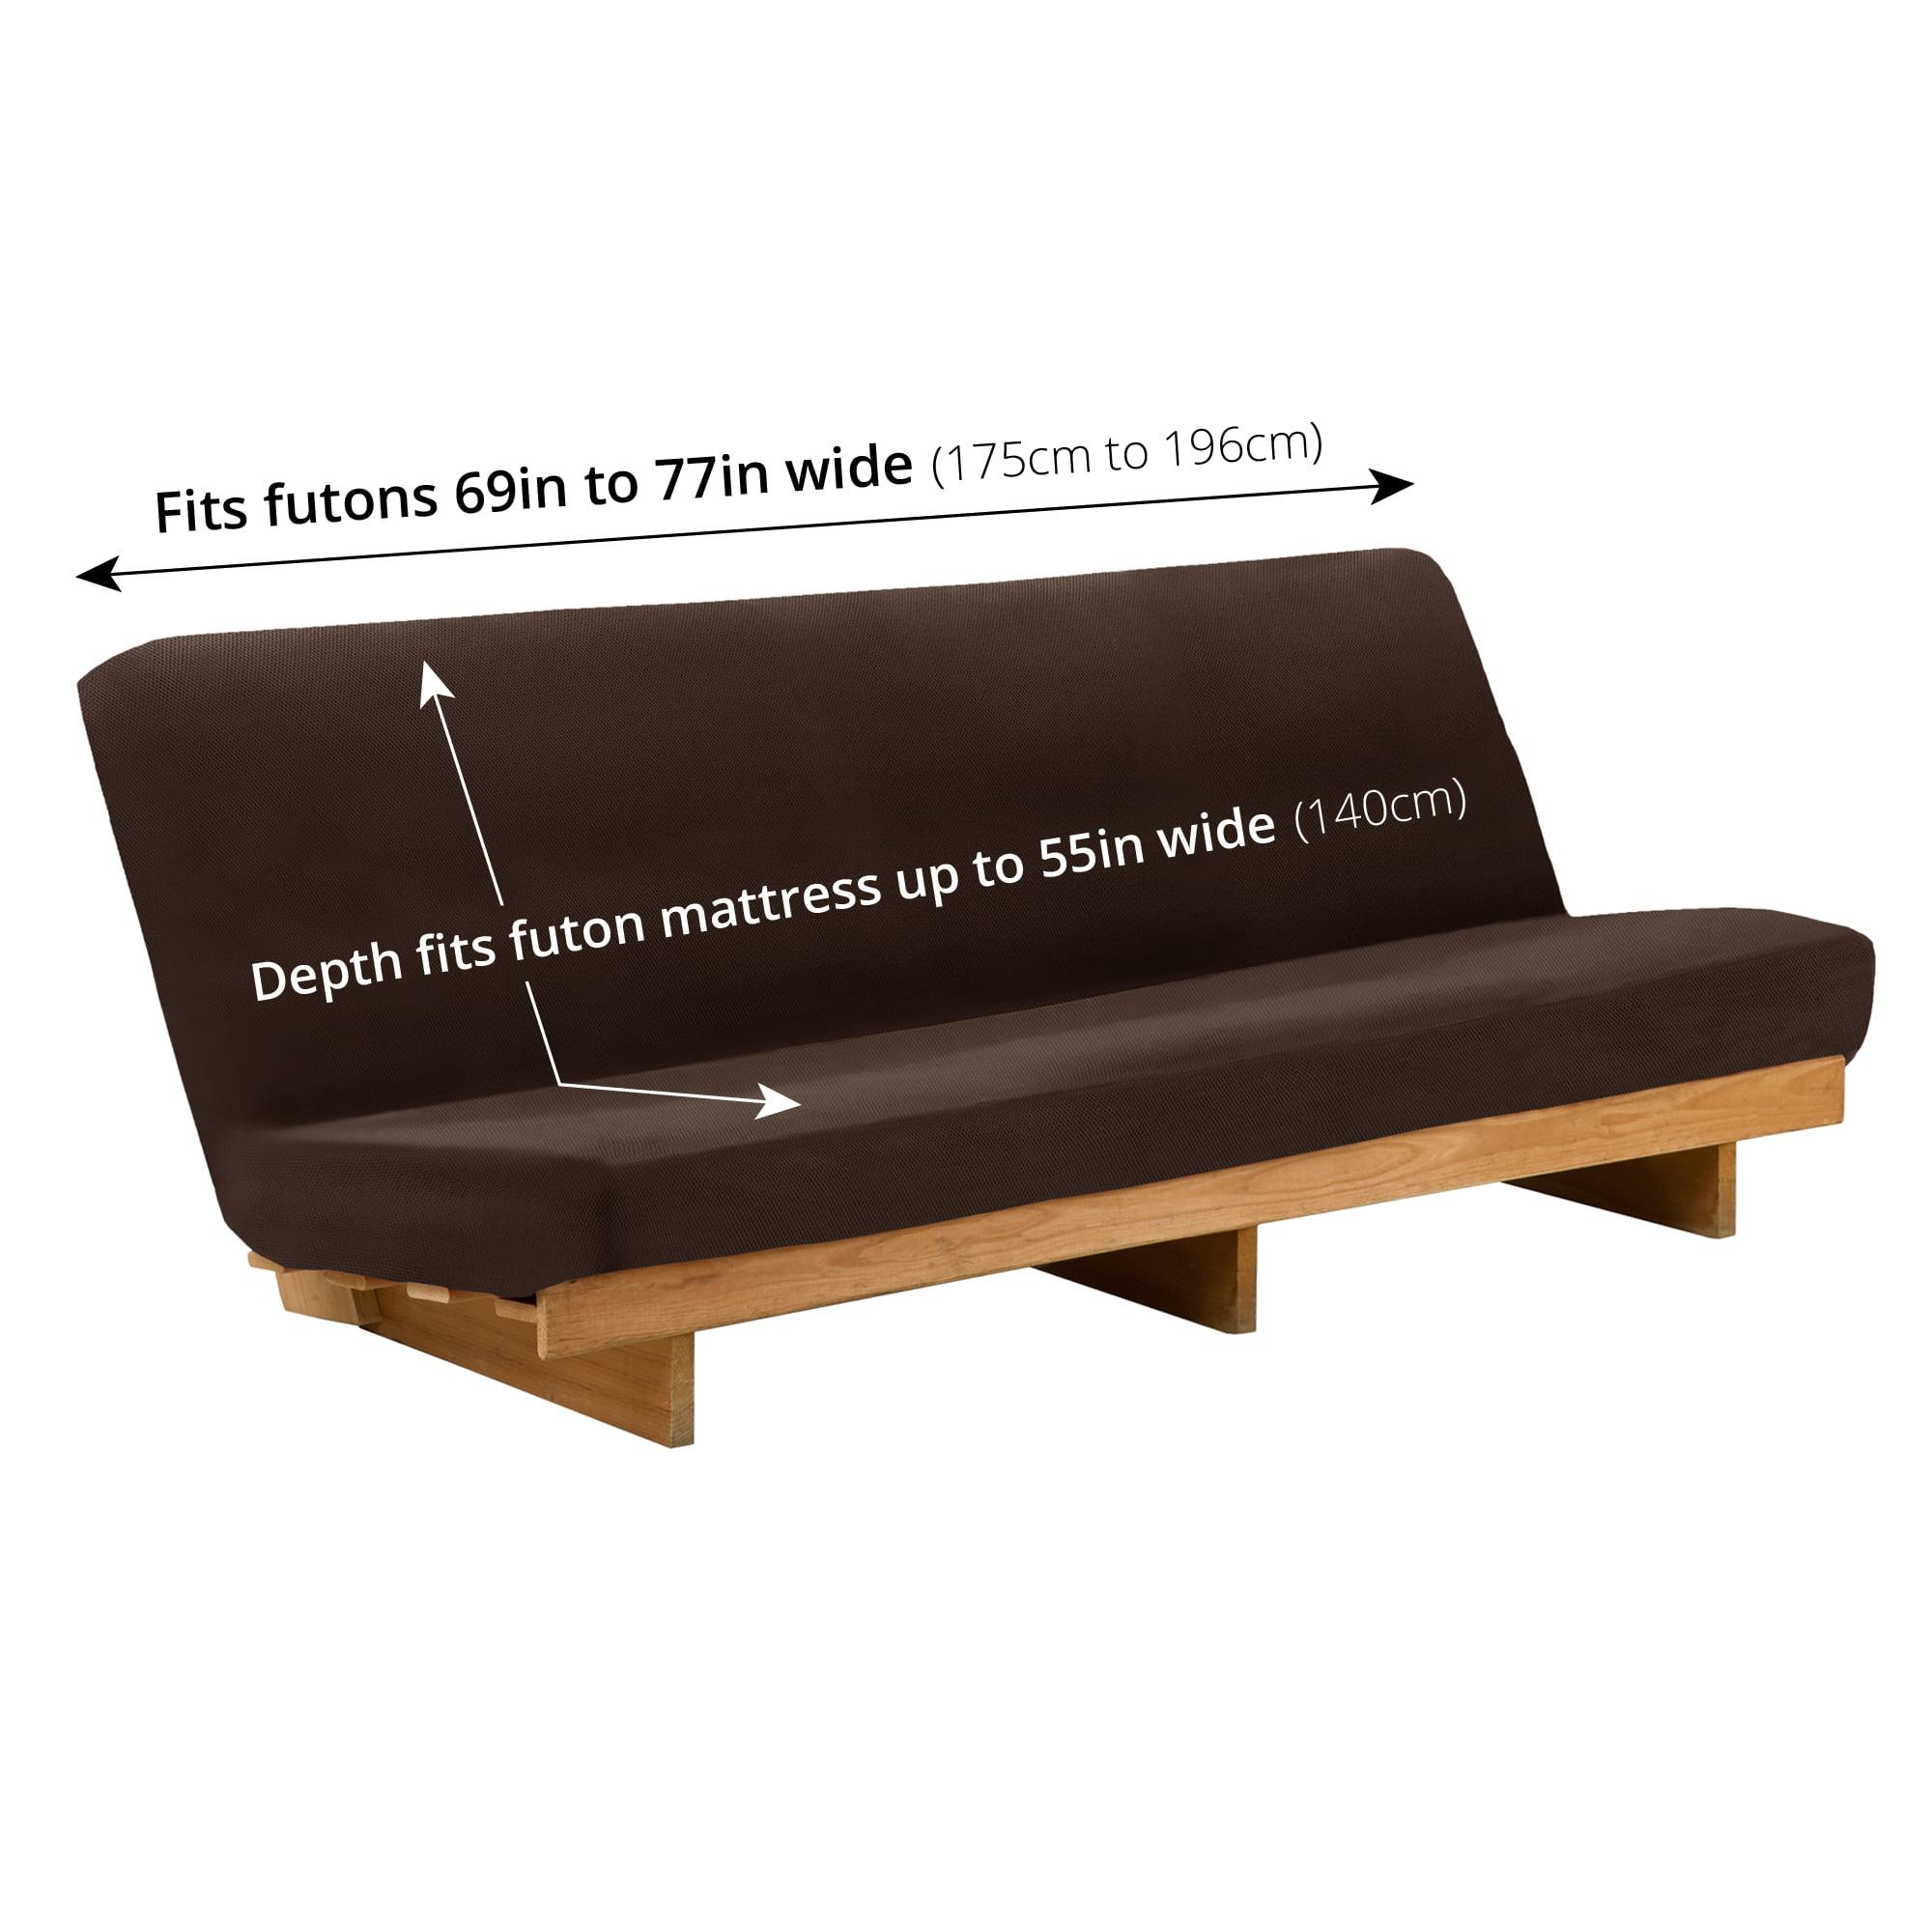 Maytex Pixel Stretch 1 Piece Futon Furniture Cover Slipcover Com